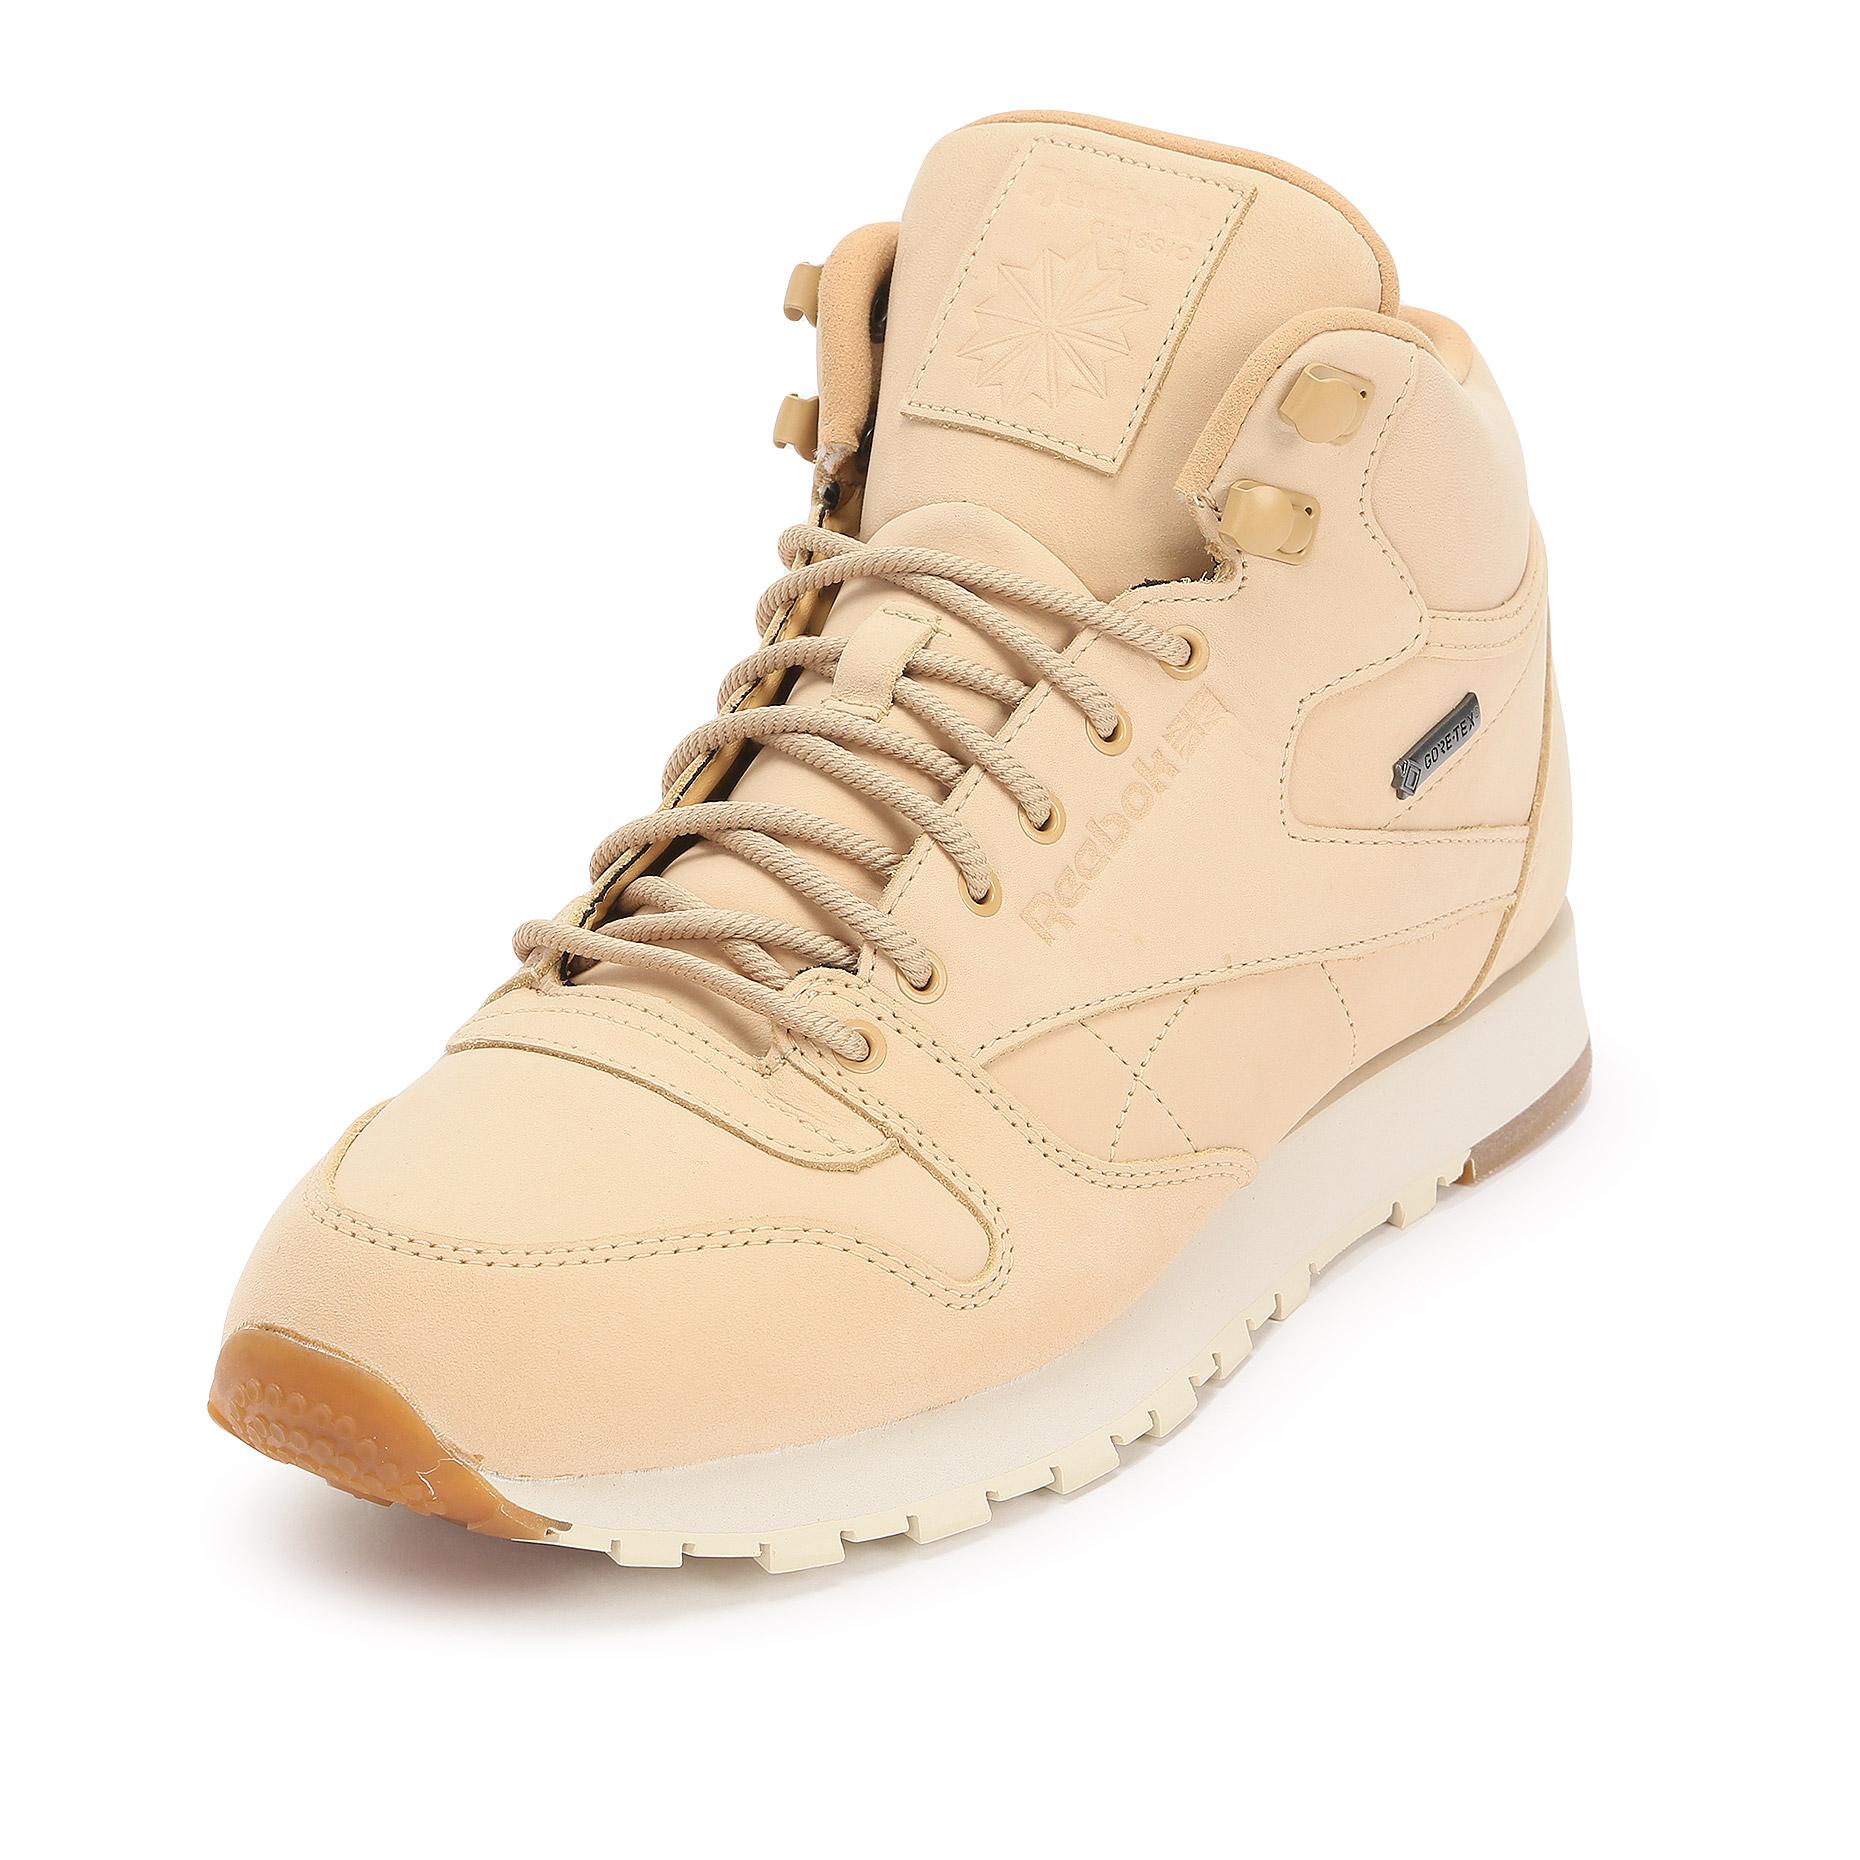 04e7e71b Мужские кроссовки Reebok Classic Classic Leather Mid Gore-Tex Thin Beige -  фото 2